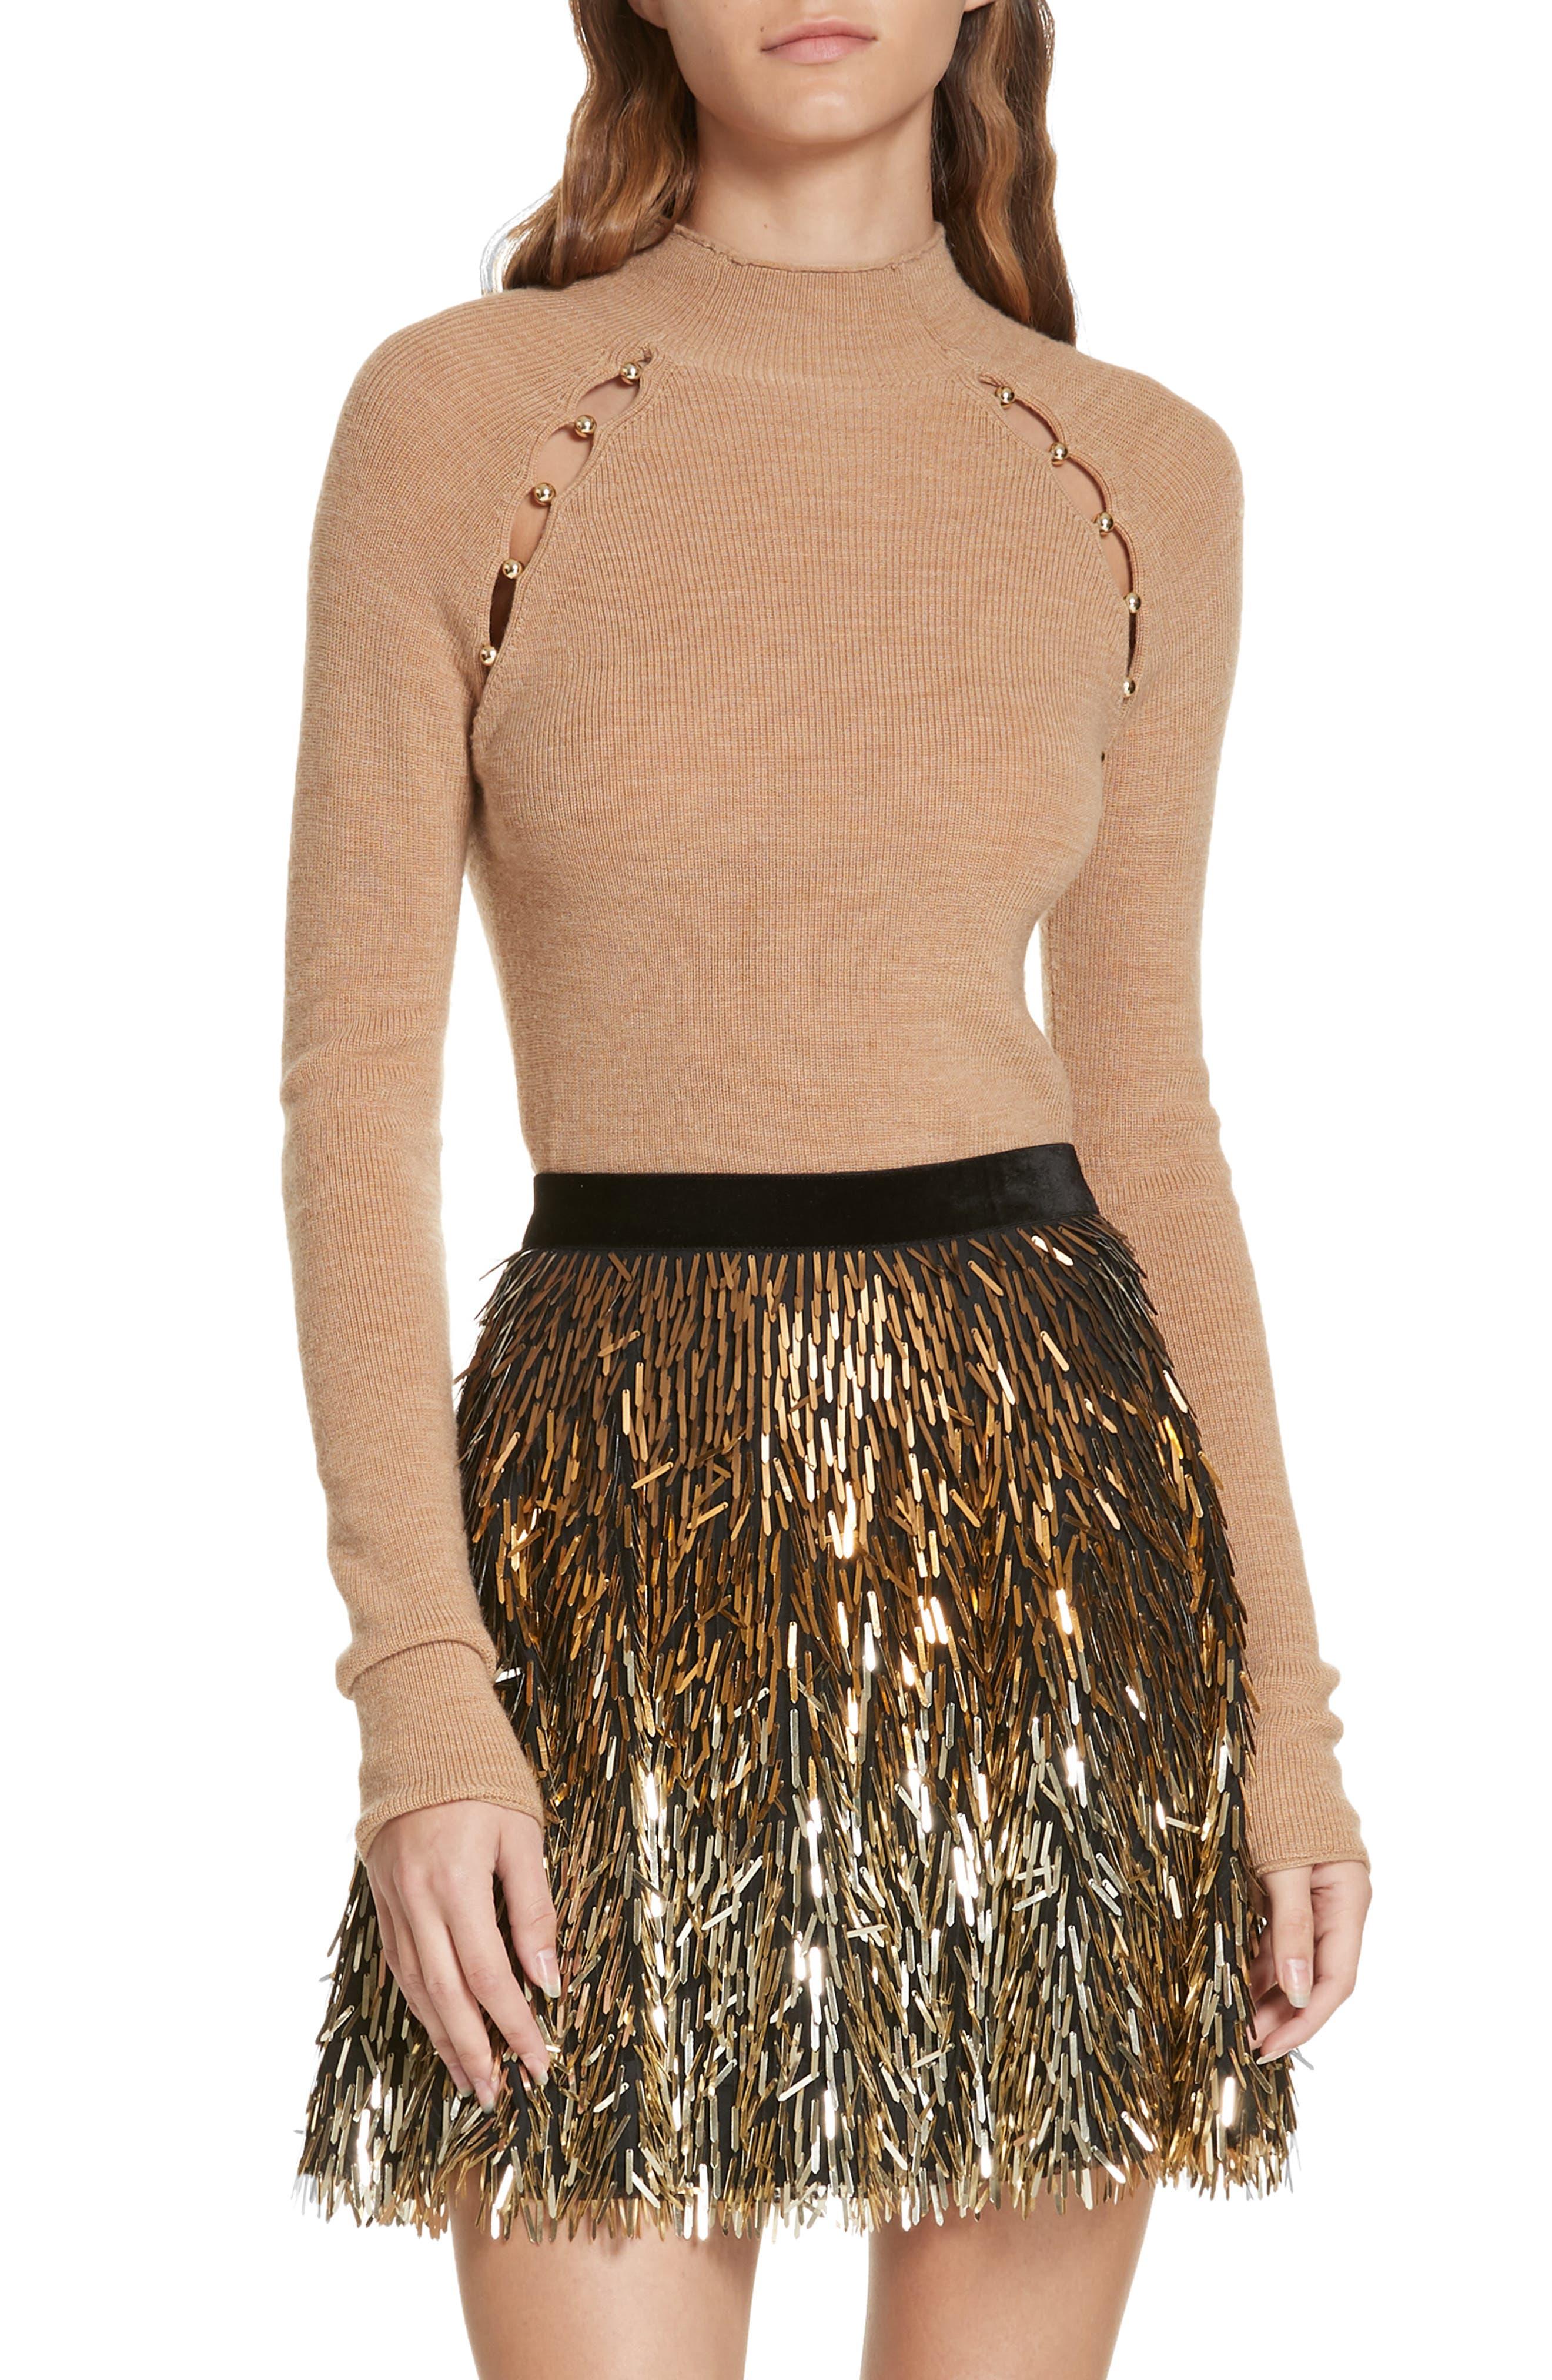 Alice+Olivia Slit Detail Sweater - Brown